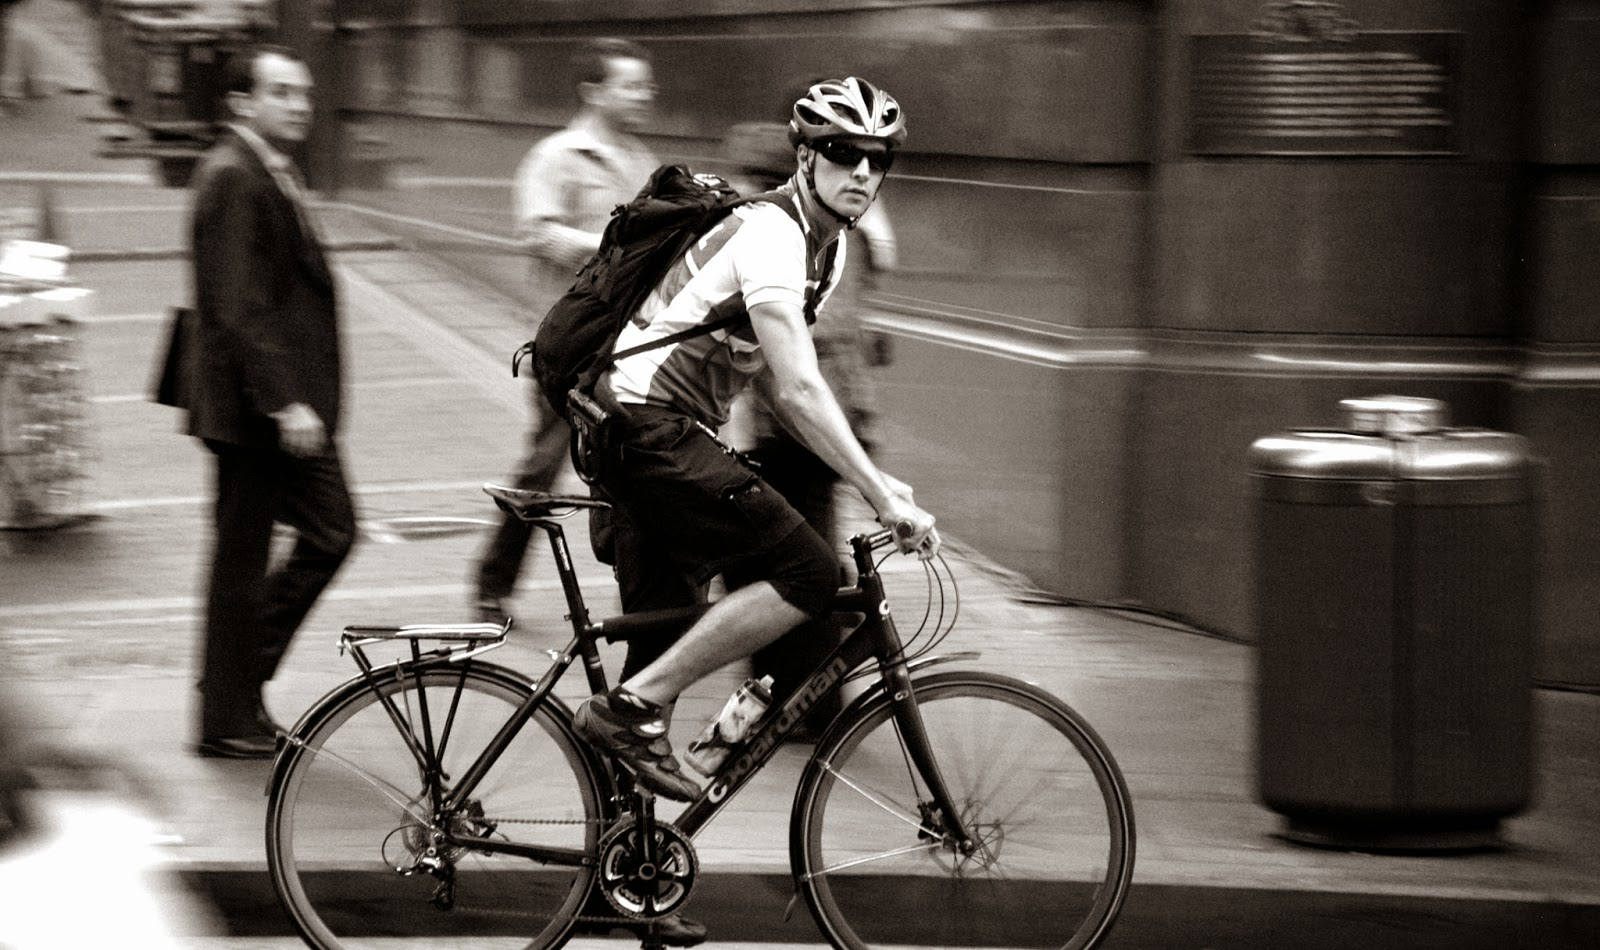 sydney bike messenger - photo#5